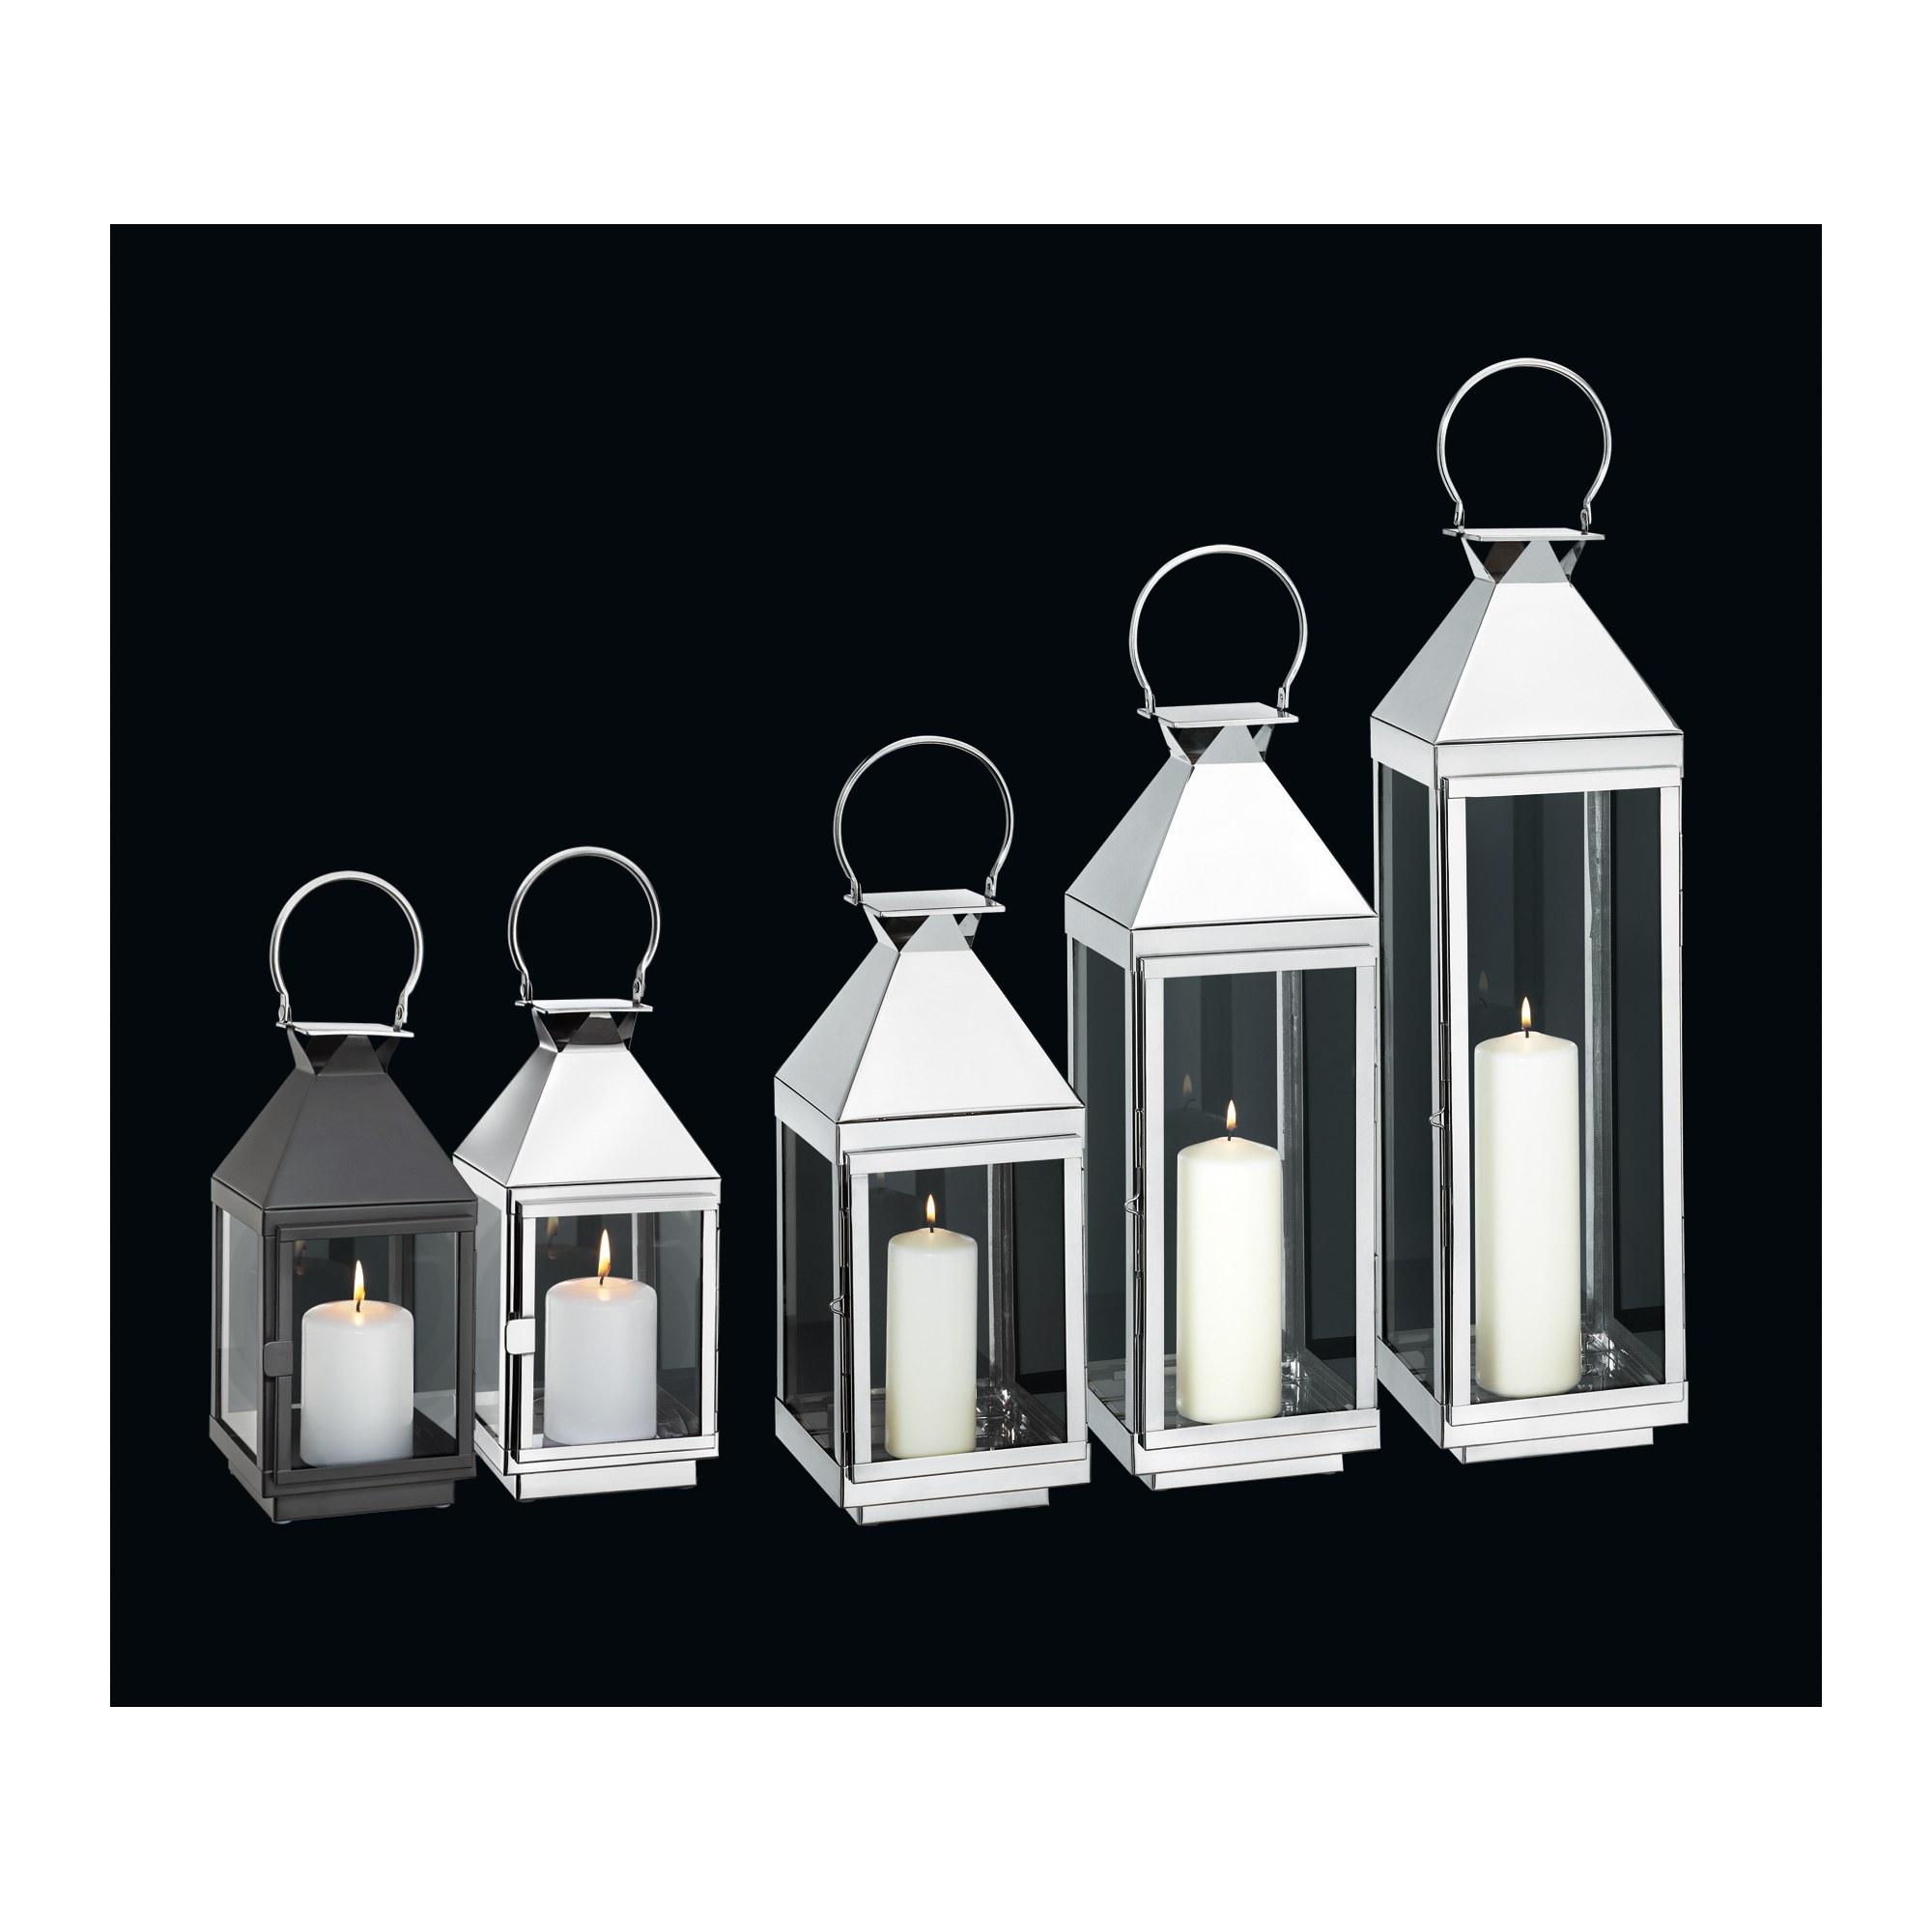 cilio edelstahl laterne villa 16 x 16 x 70 cm ebay. Black Bedroom Furniture Sets. Home Design Ideas